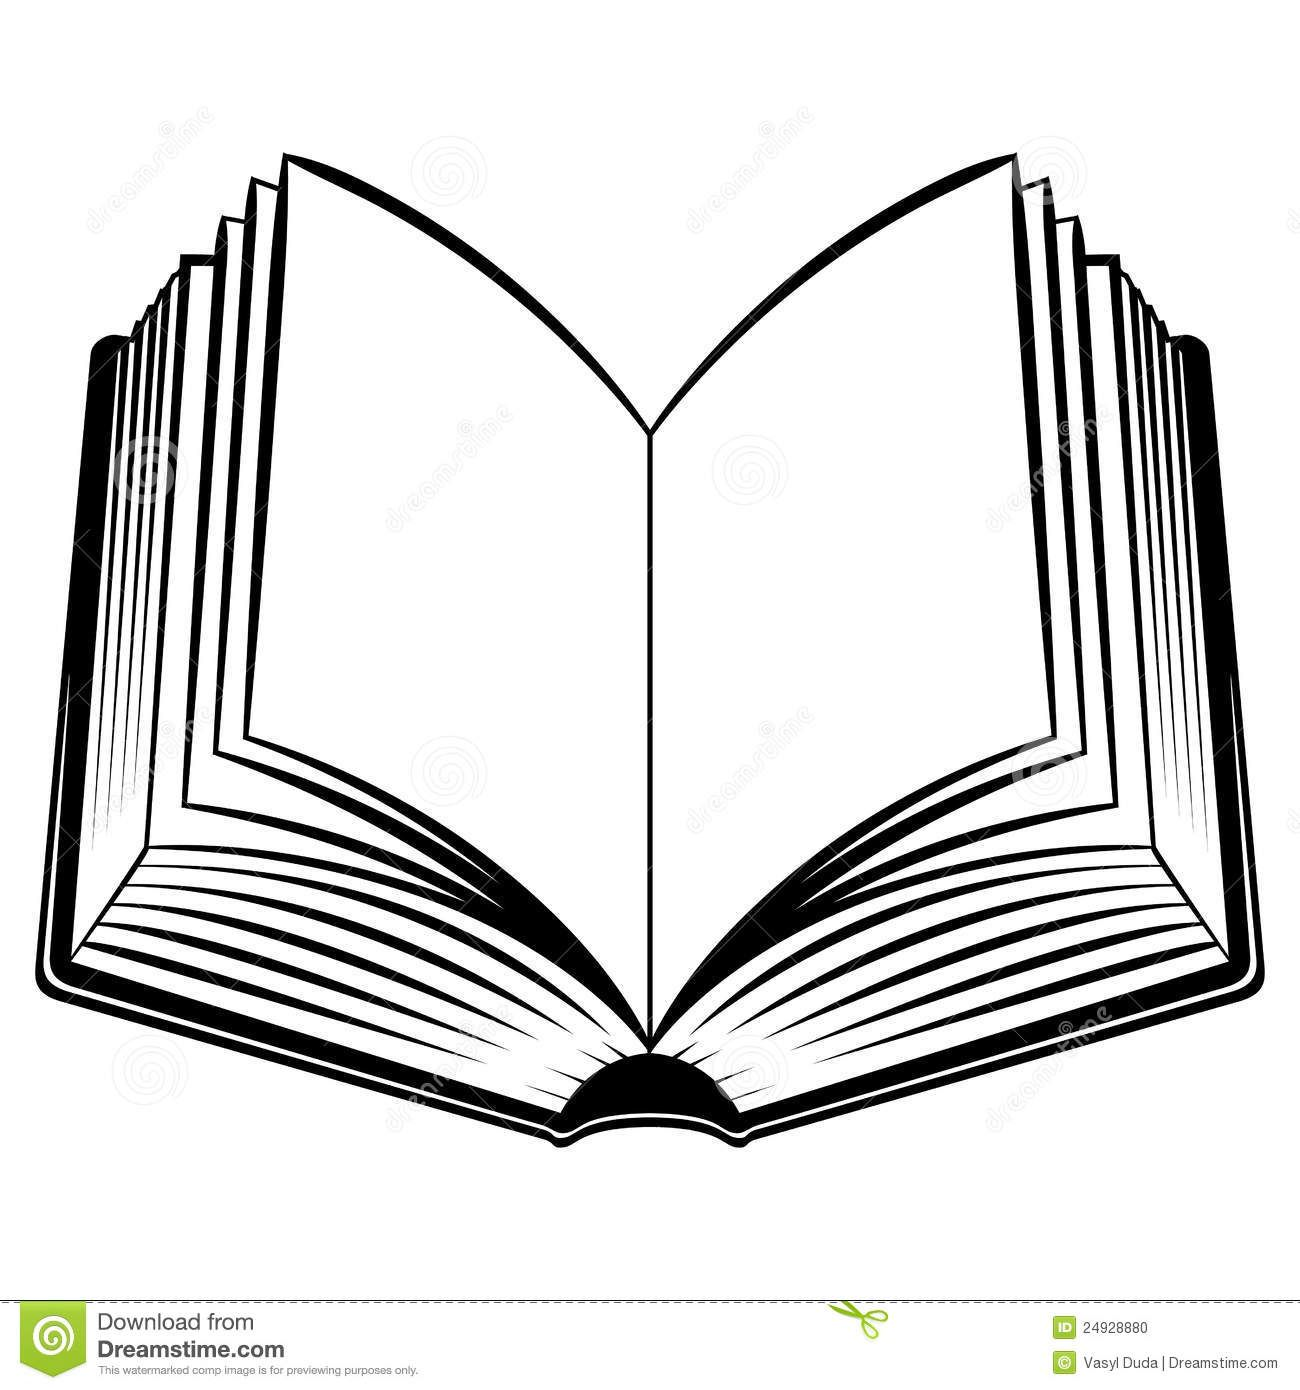 Image Result For Books Outline